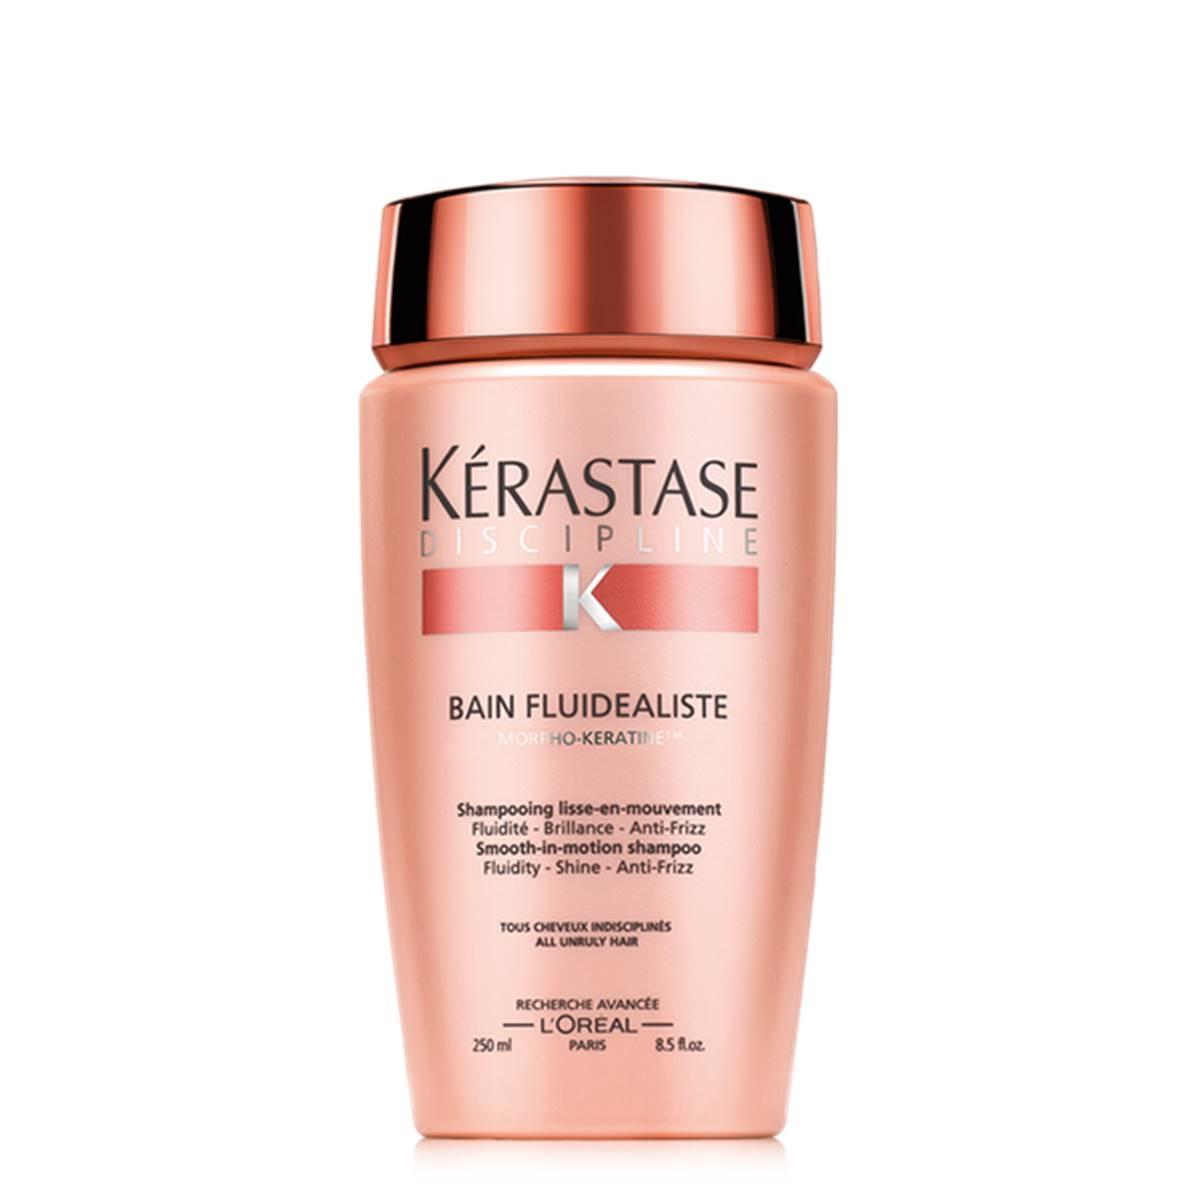 Shampoo Kerastase Discipline Fluidealiste 250ml